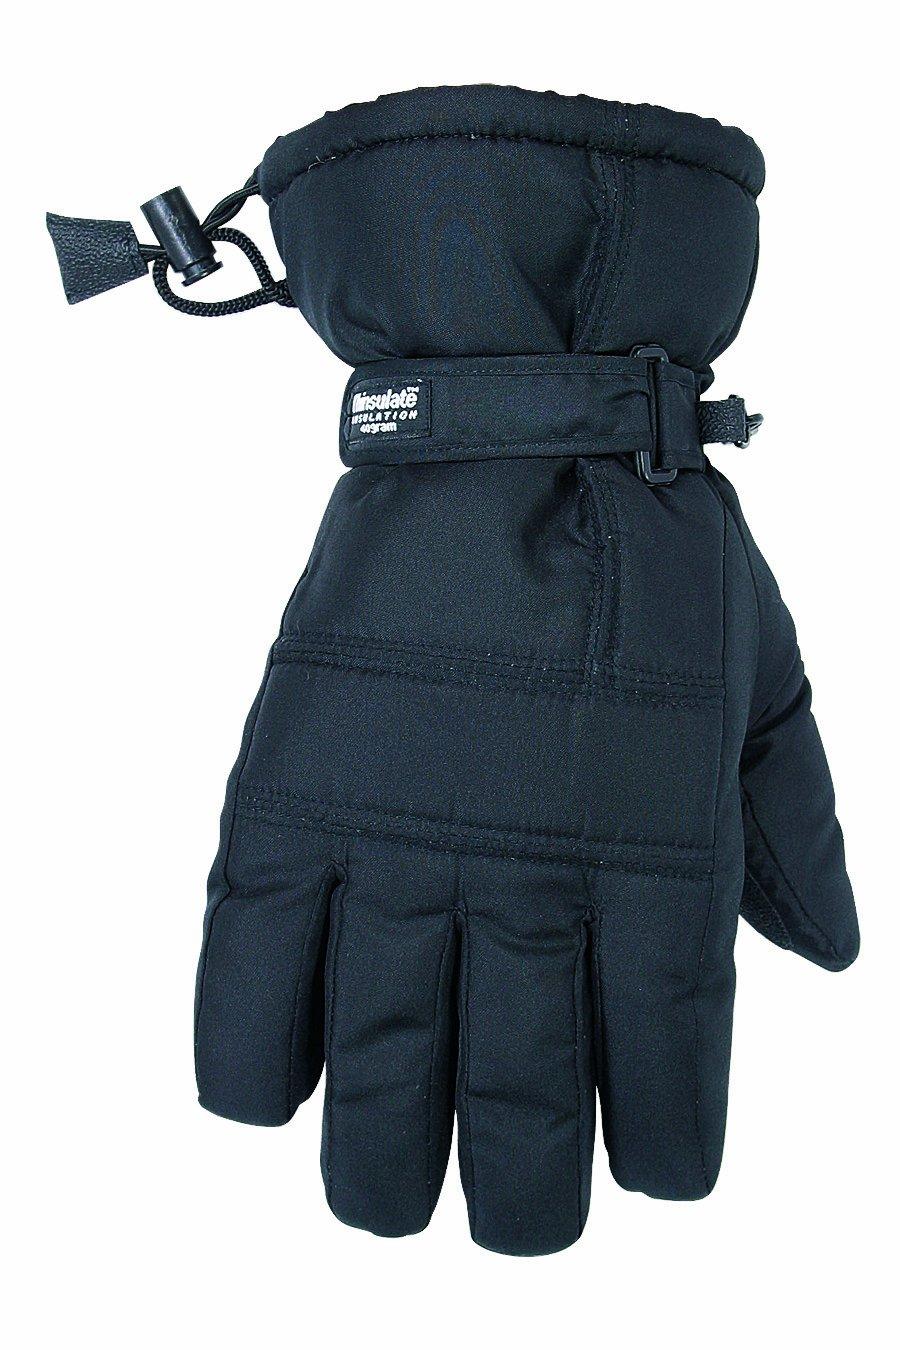 CLC Custom Leathercraft 2077L Black Ski Glove, Large